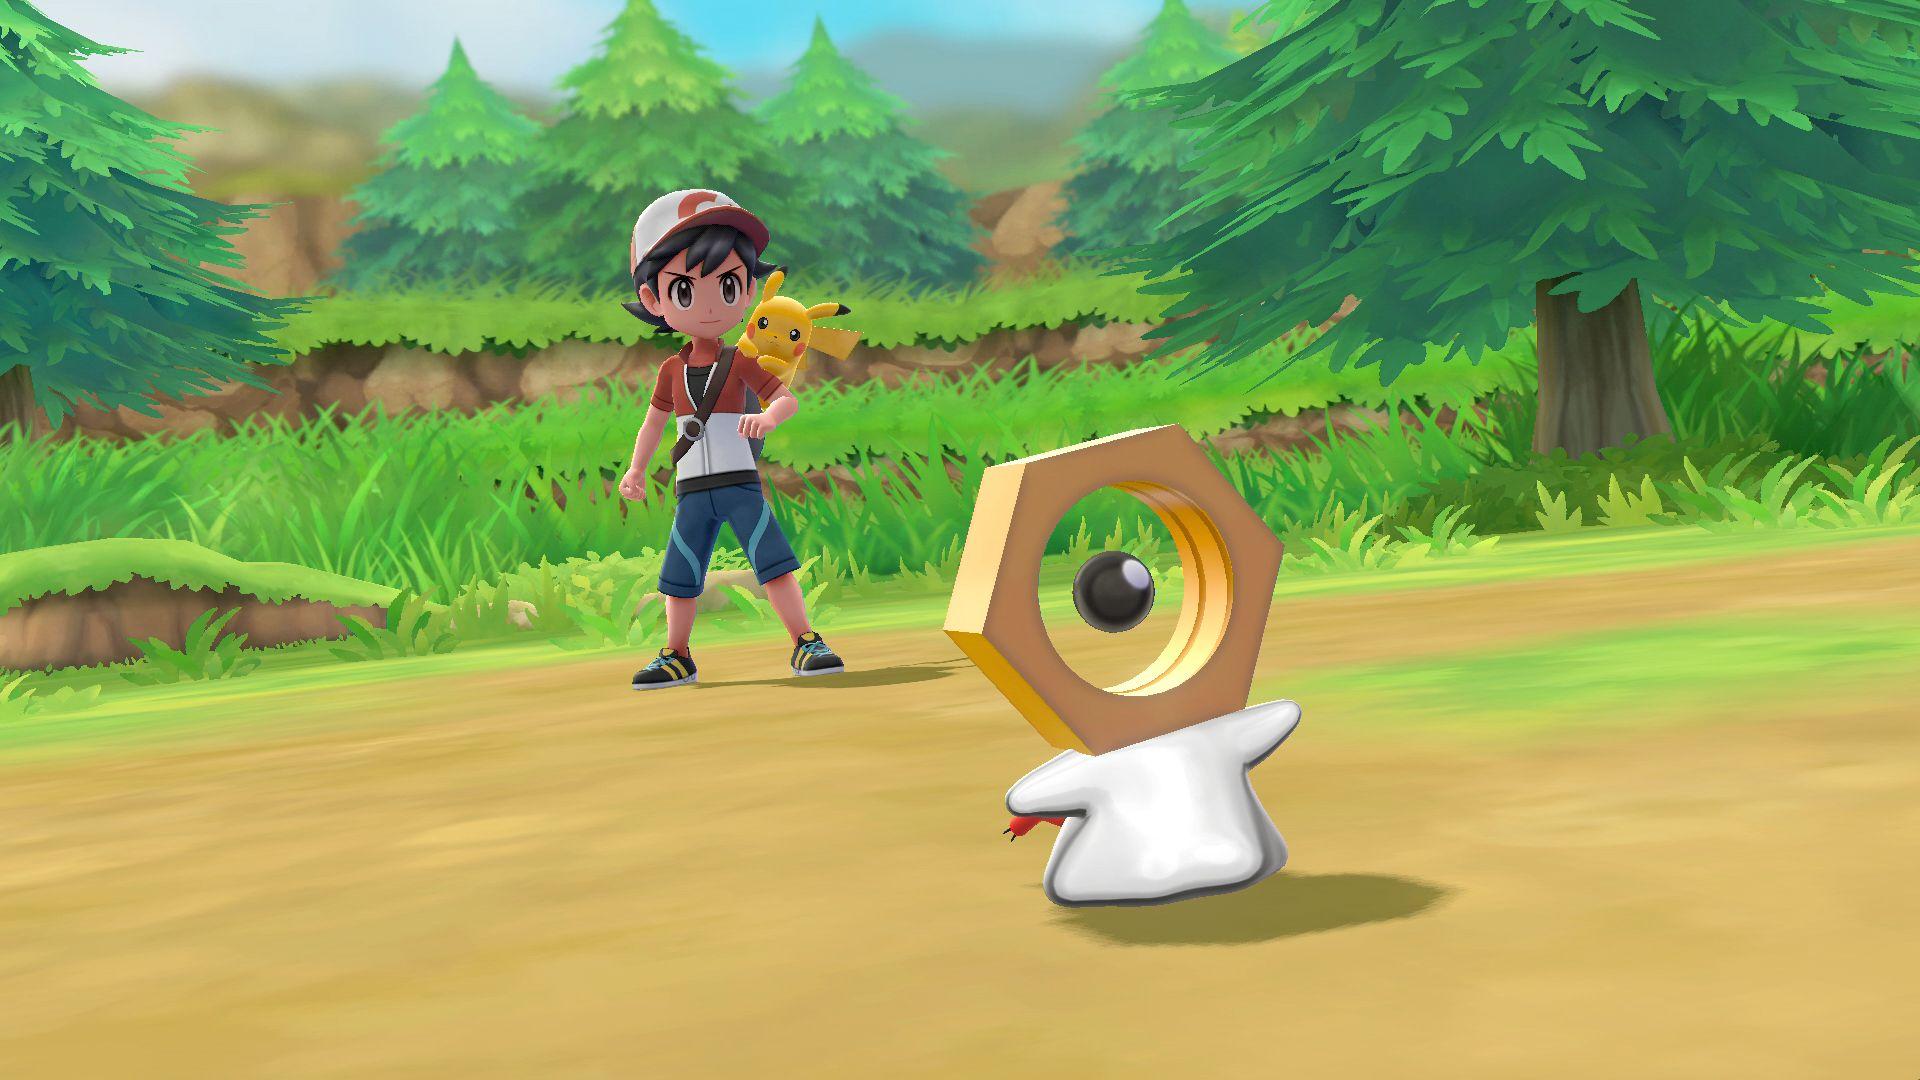 Pokémon GO reveals new pokémon Meltan – but is it gen 8?